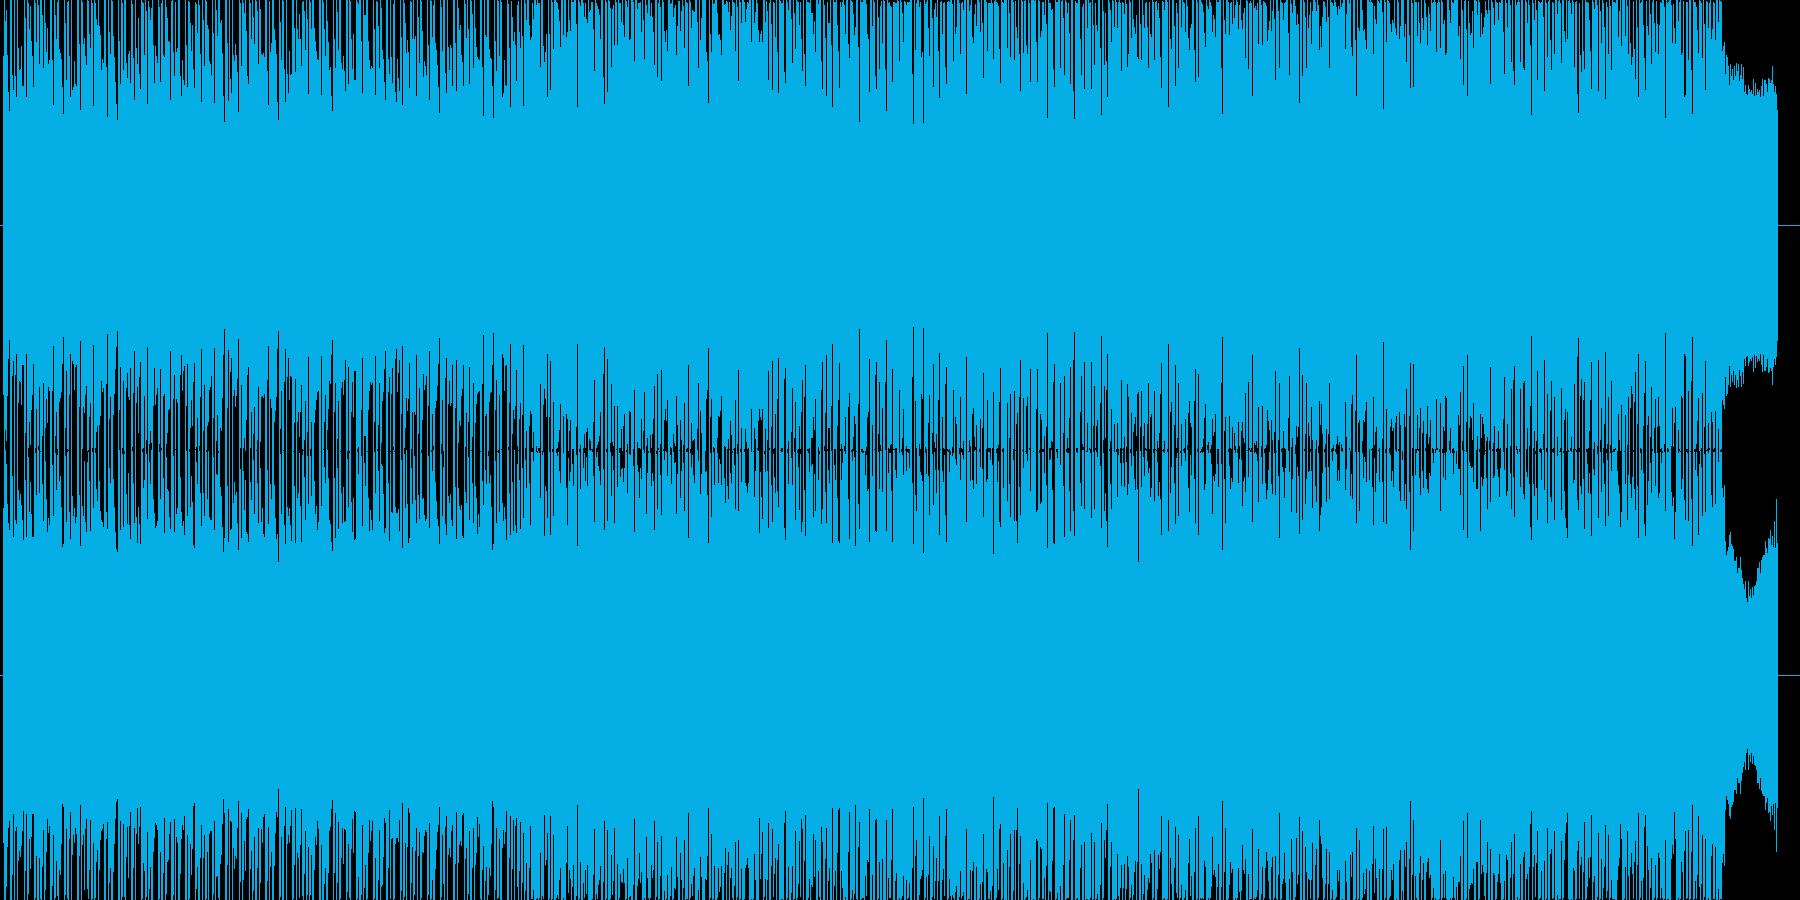 ☆YOU TUBE動画用☆陽気なピアノ曲の再生済みの波形